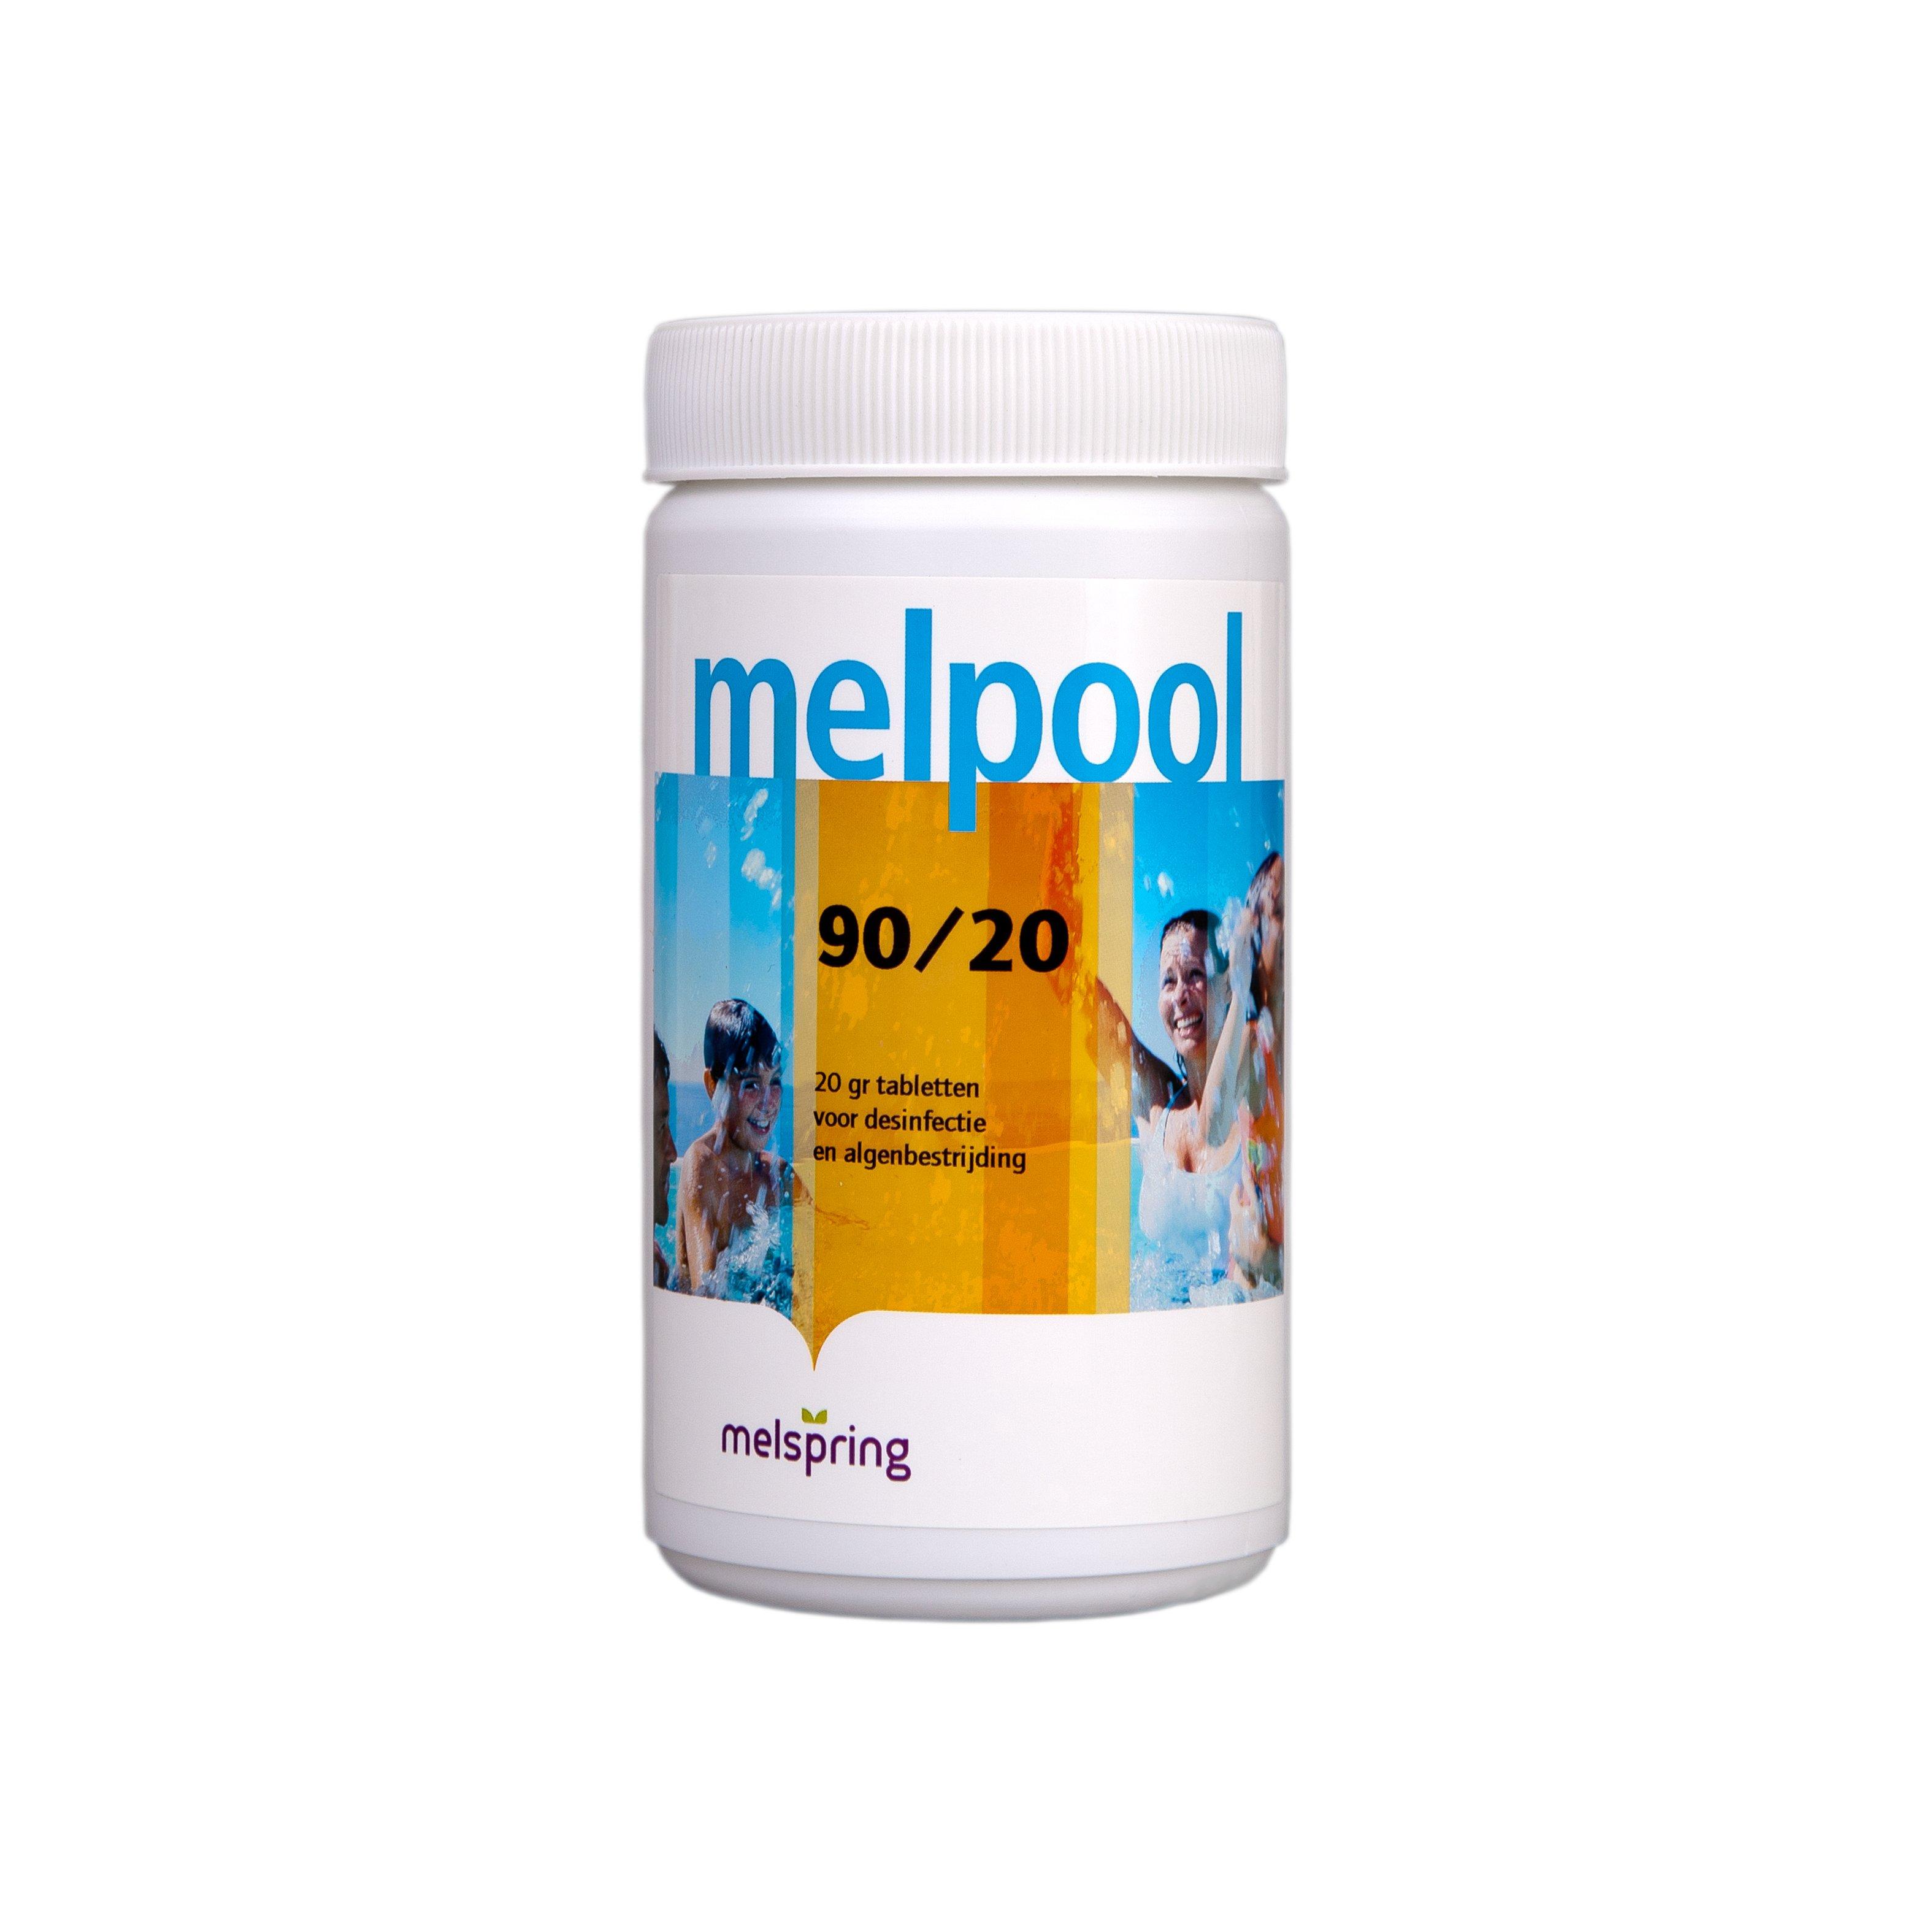 melpool chloor tabletten 90 20 1 kg